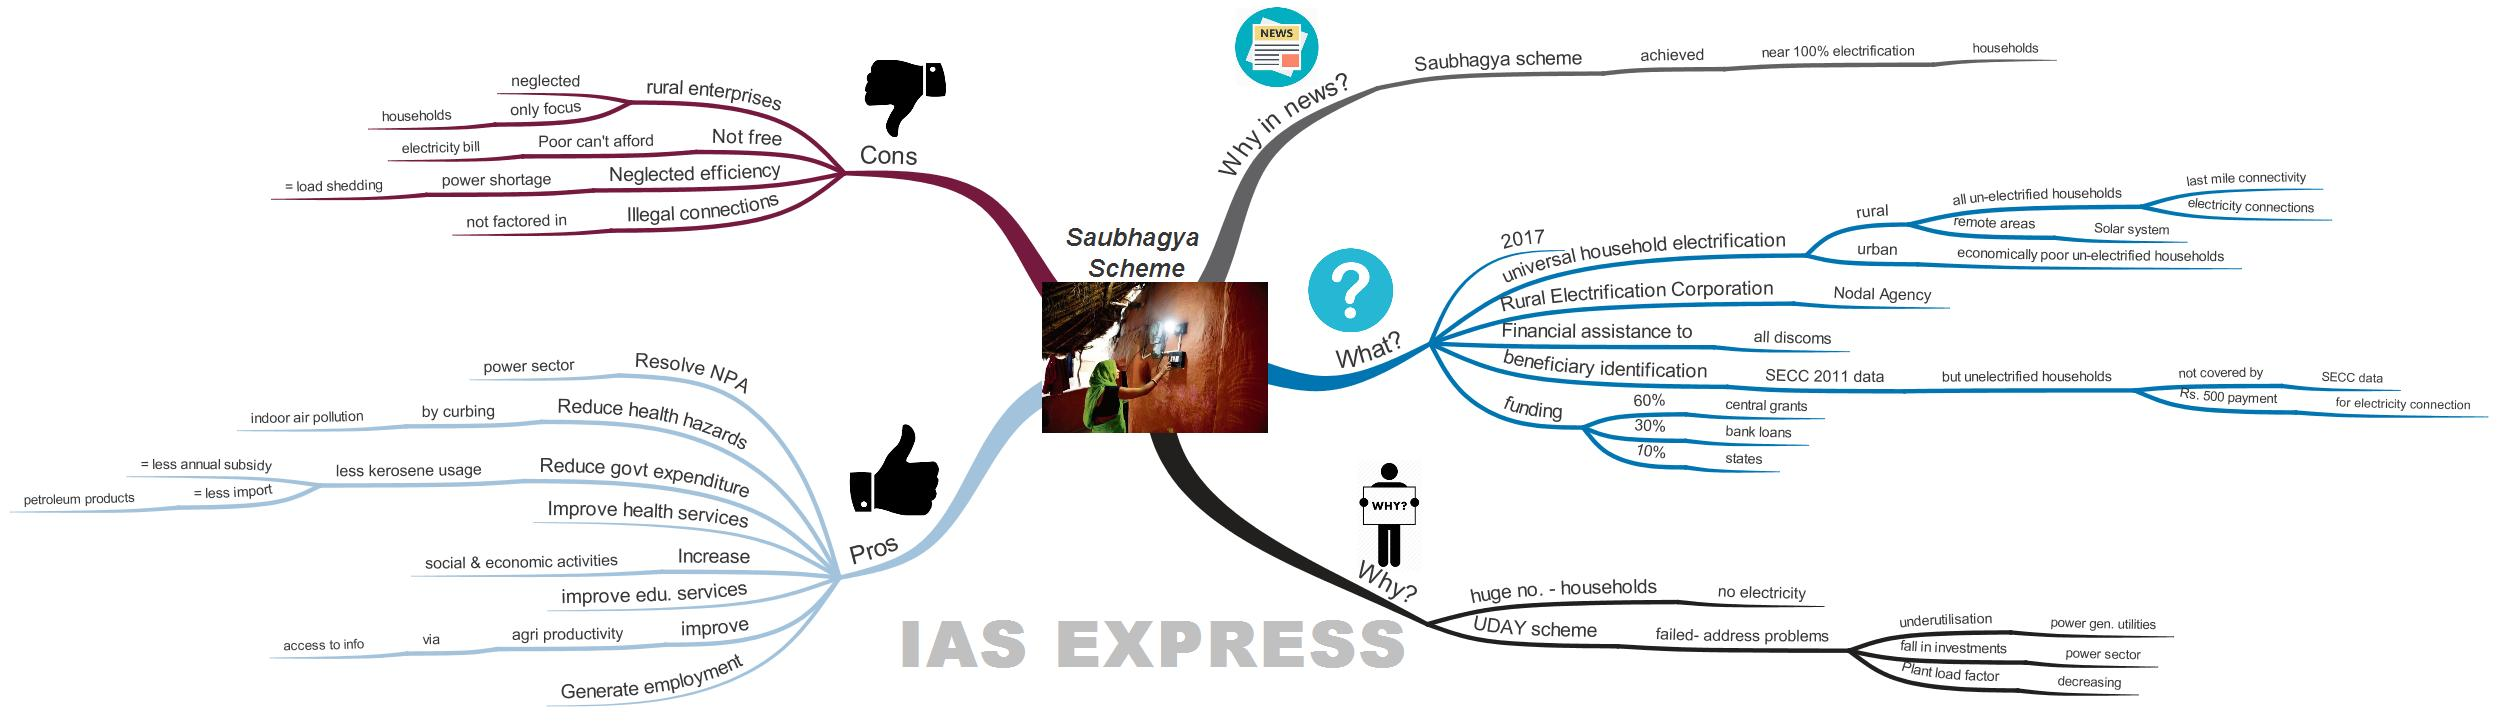 Saubhagya Scheme upsc ias gk